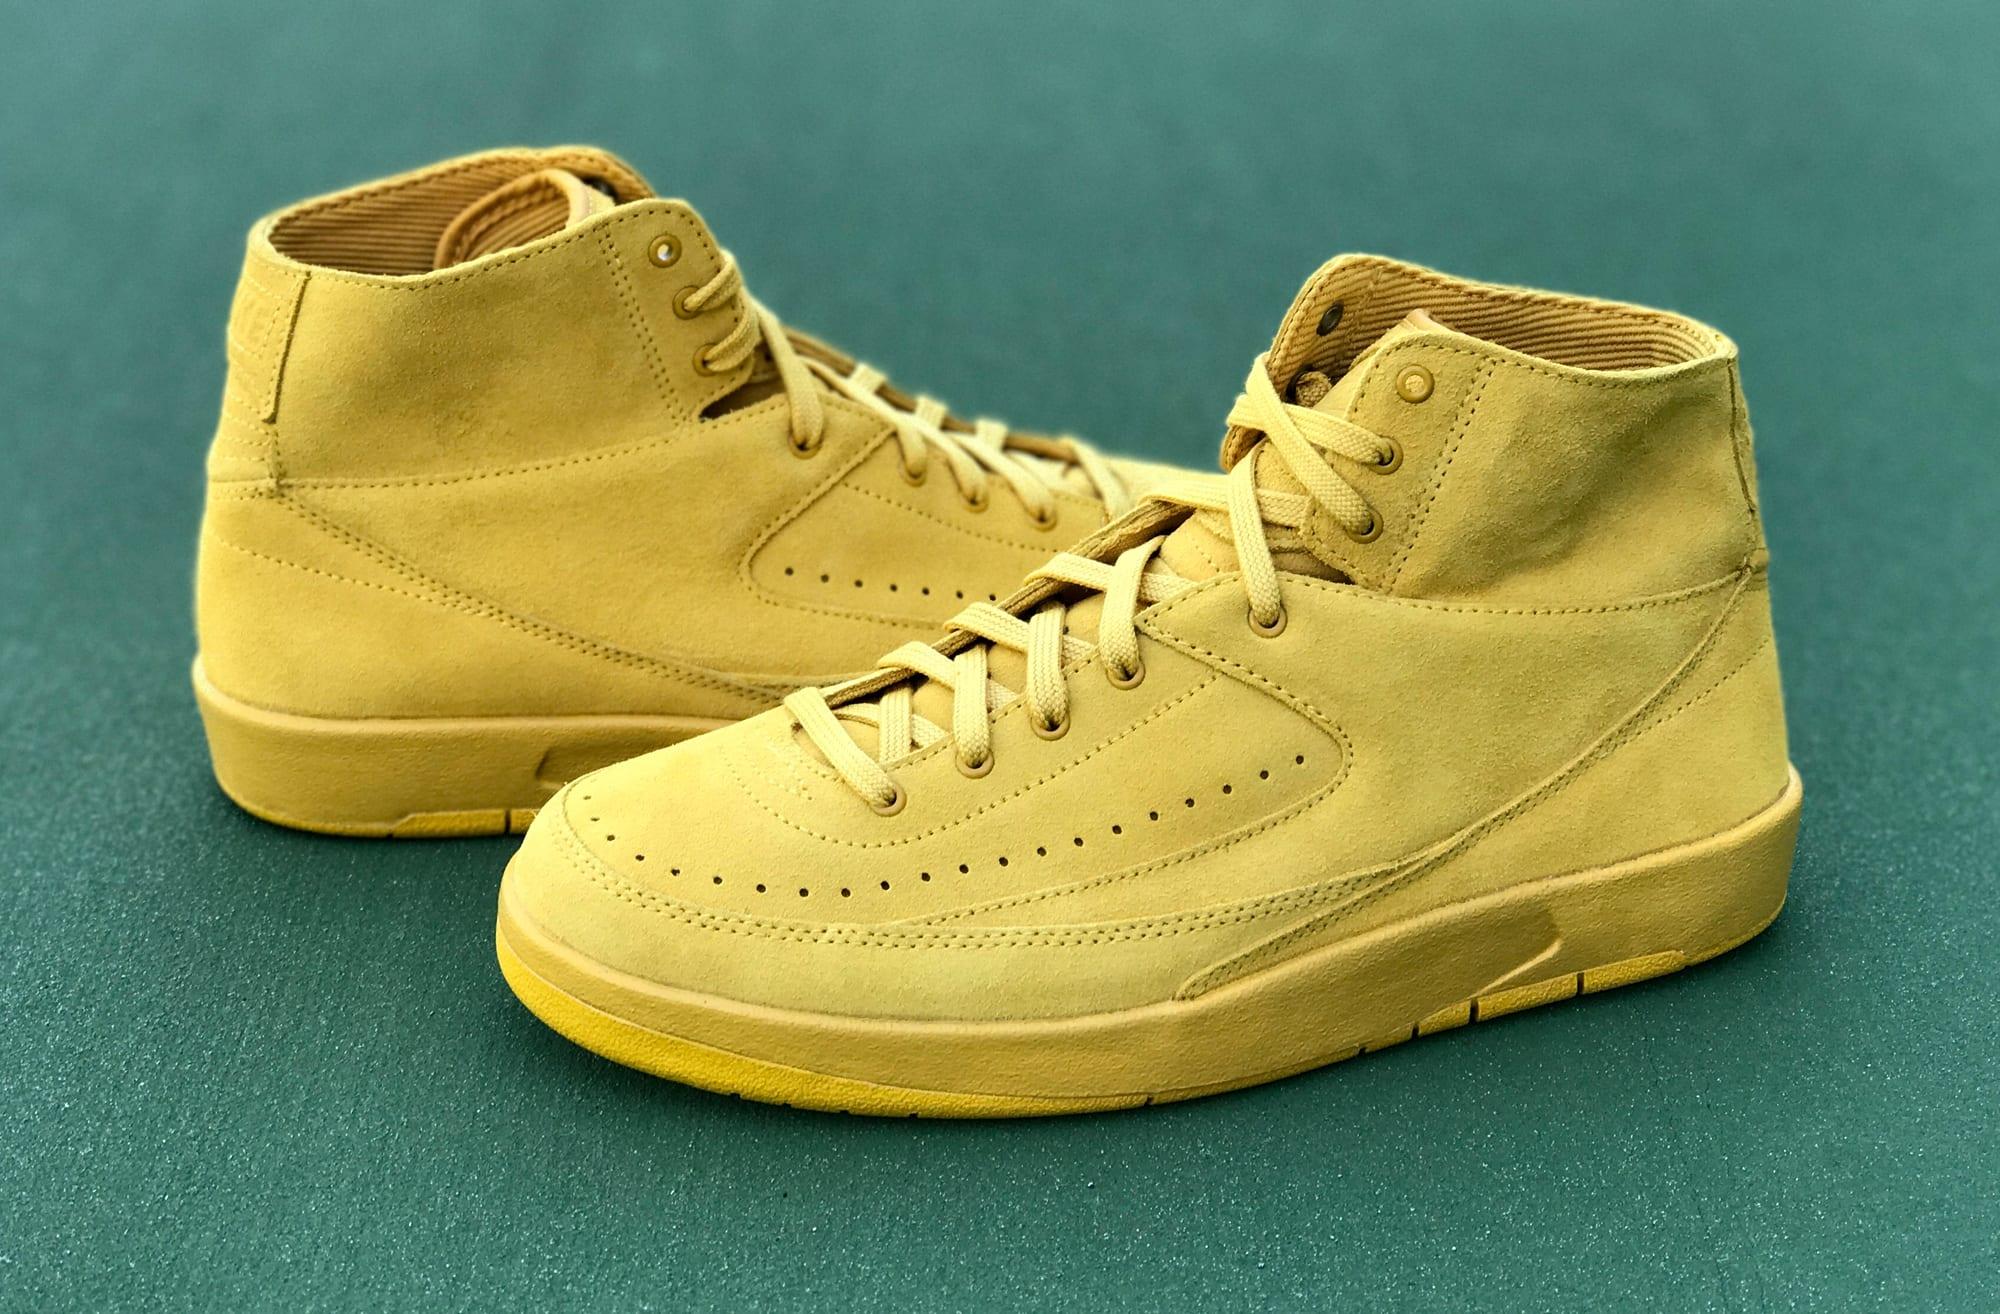 Mineral Gold Air Jordan 2 Decon